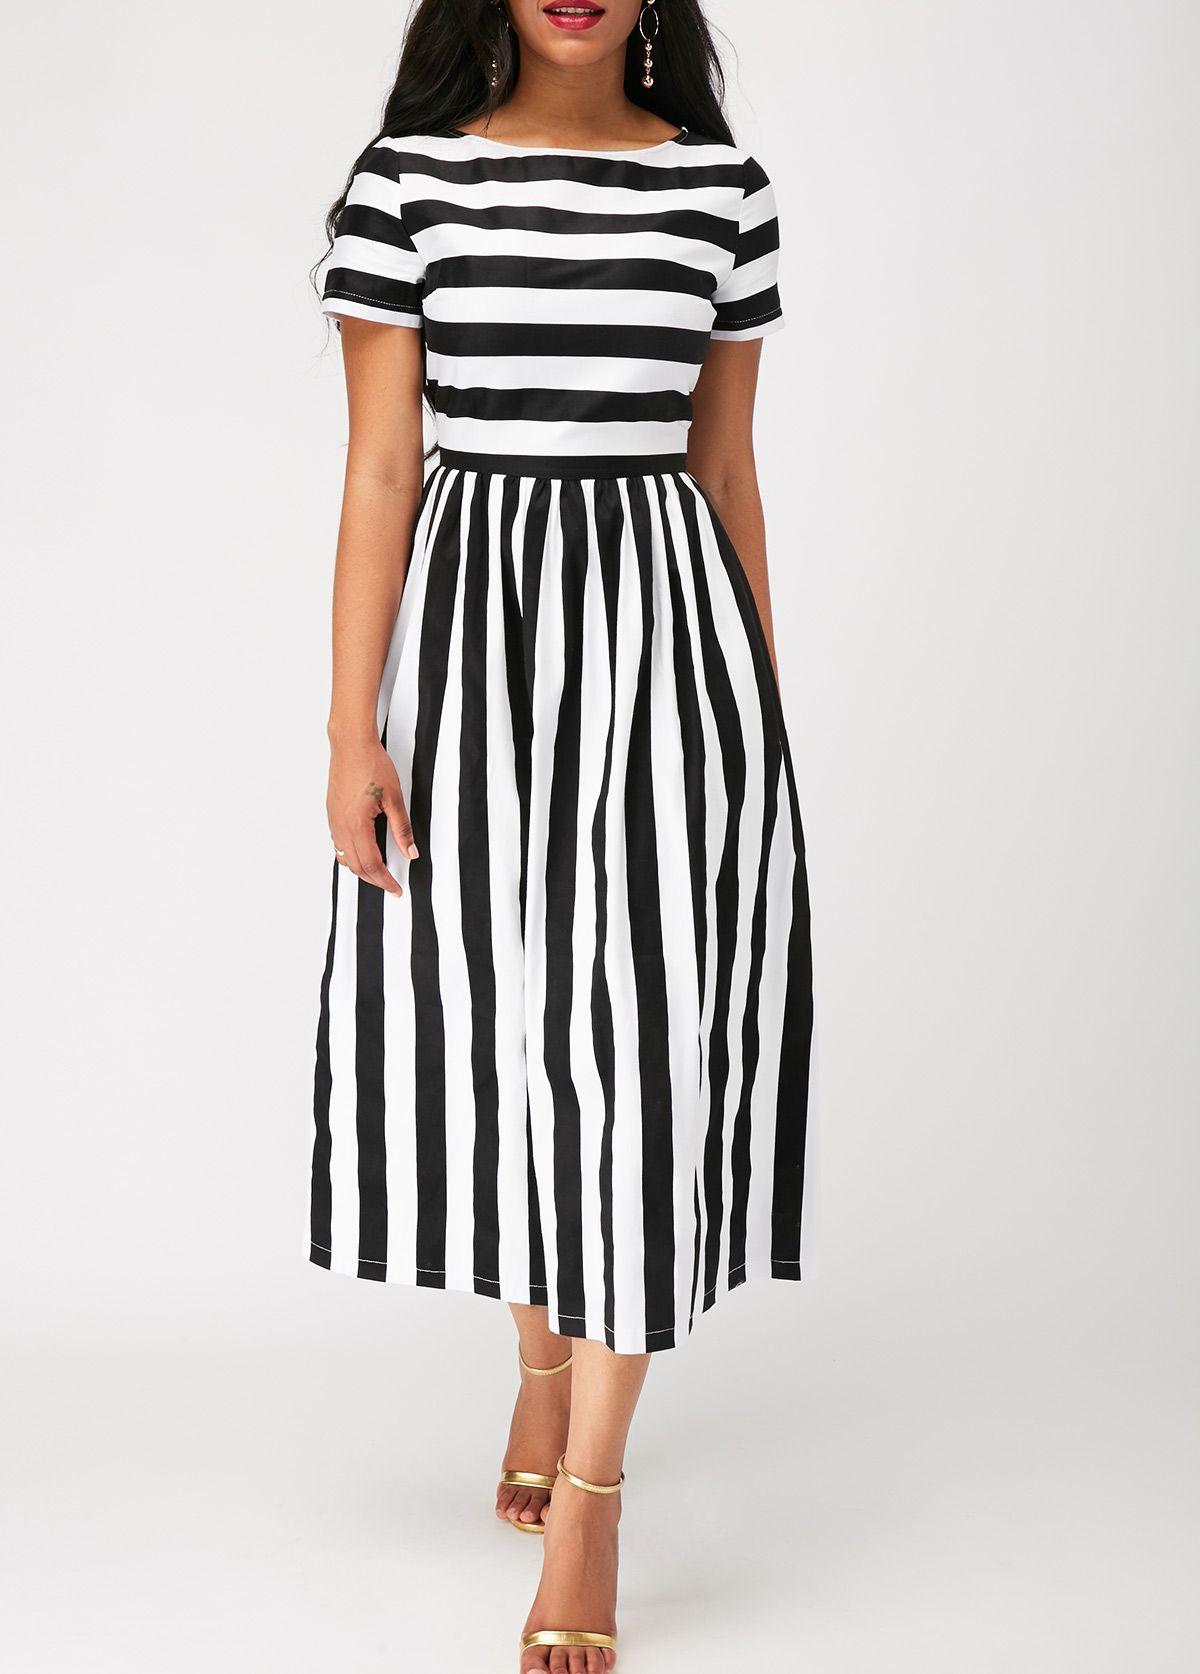 Stripe print short sleeve zipper back dress on sale only us